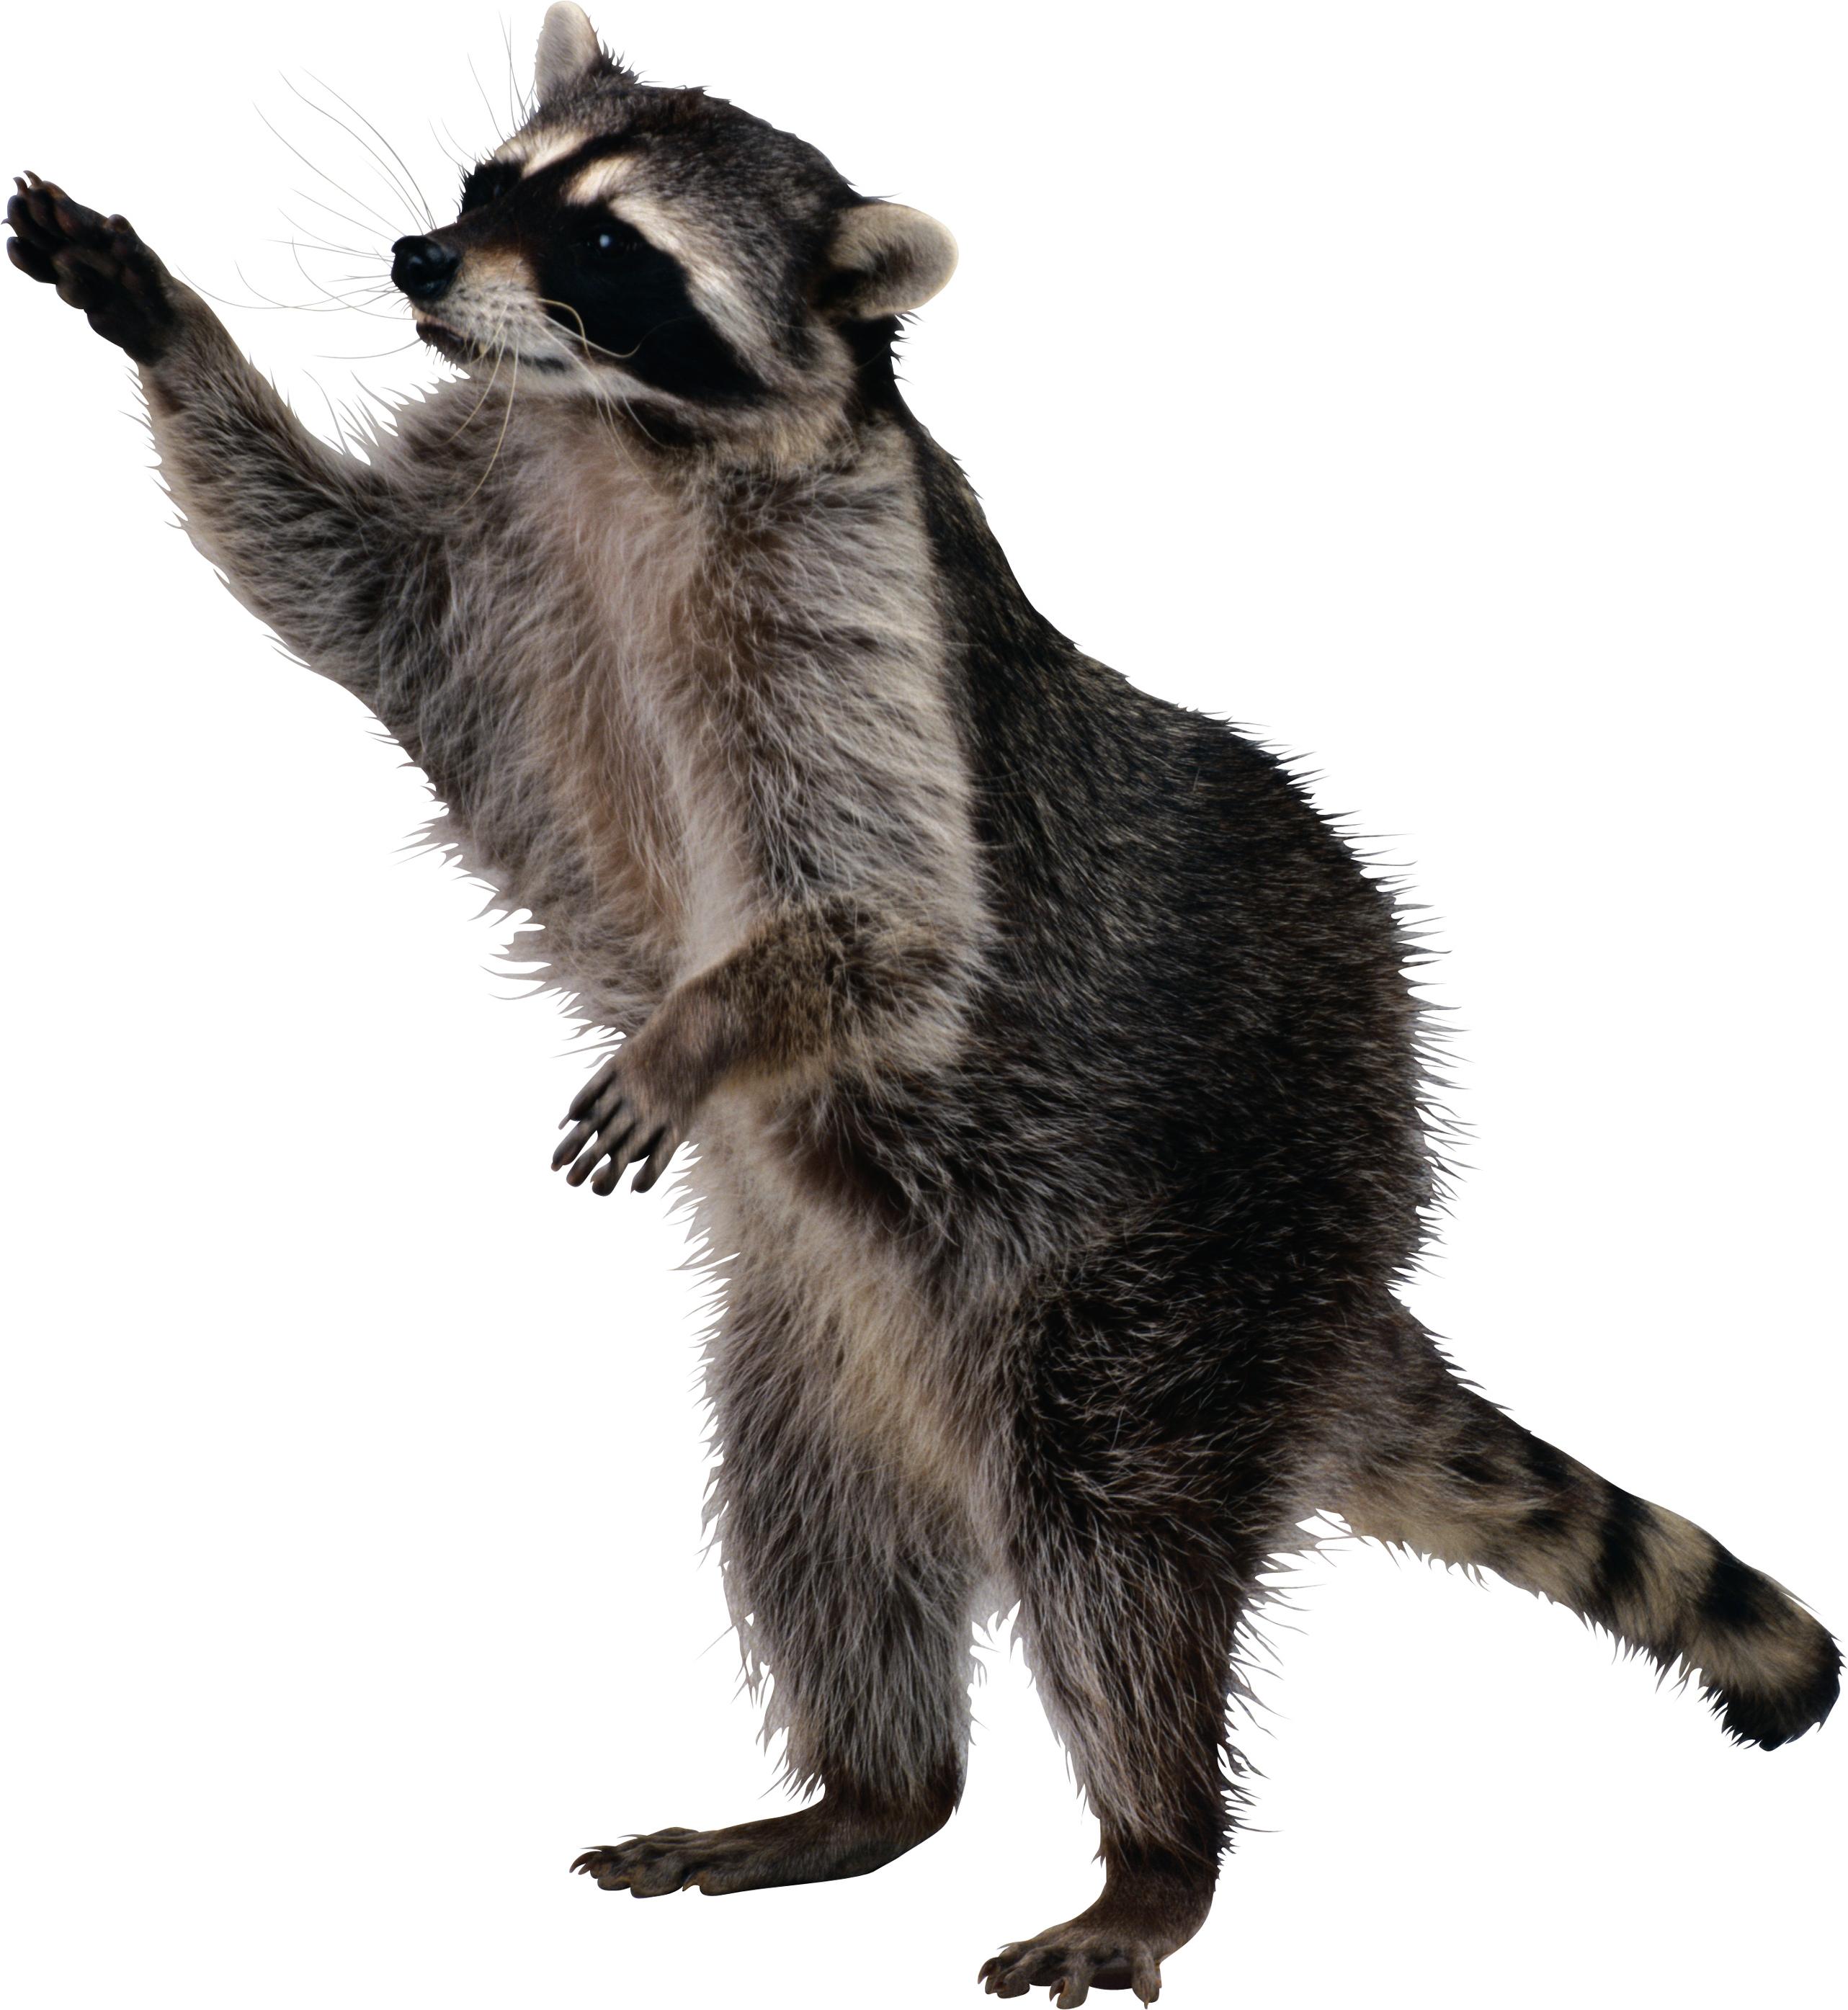 raccoon_PNG16965.png (2565×2790)   енот   Pinterest   Raccoons and Animal - Raccoon HD PNG